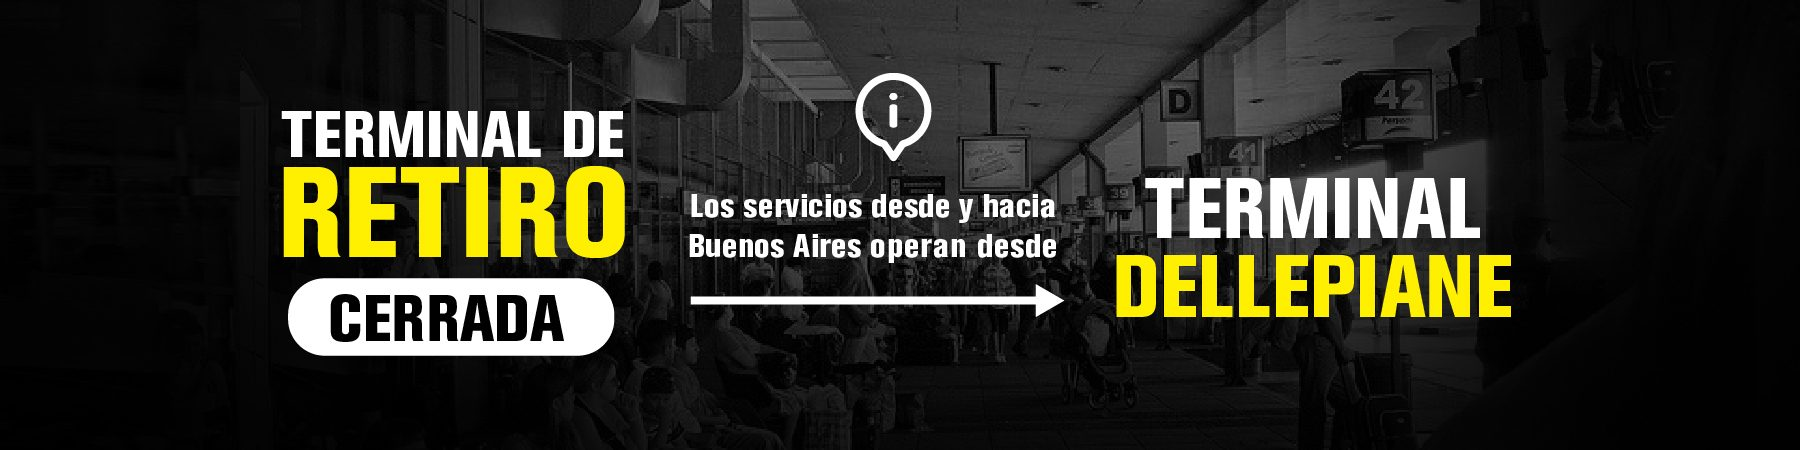 Terminal dellepiane terminal retiro cerrada viajar micro argentina Flecha Bus